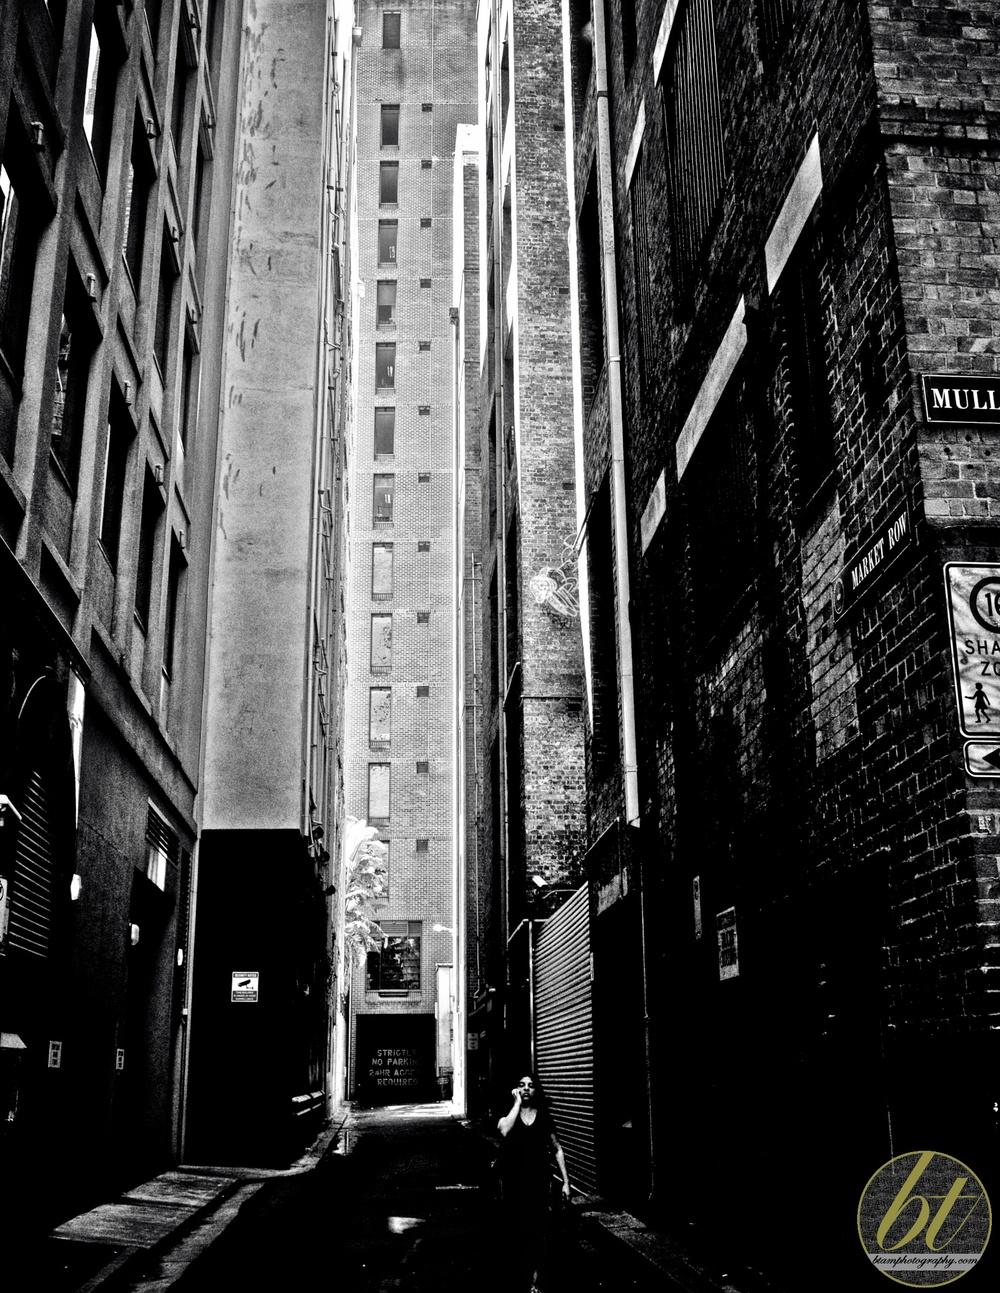 Market Row alleyway